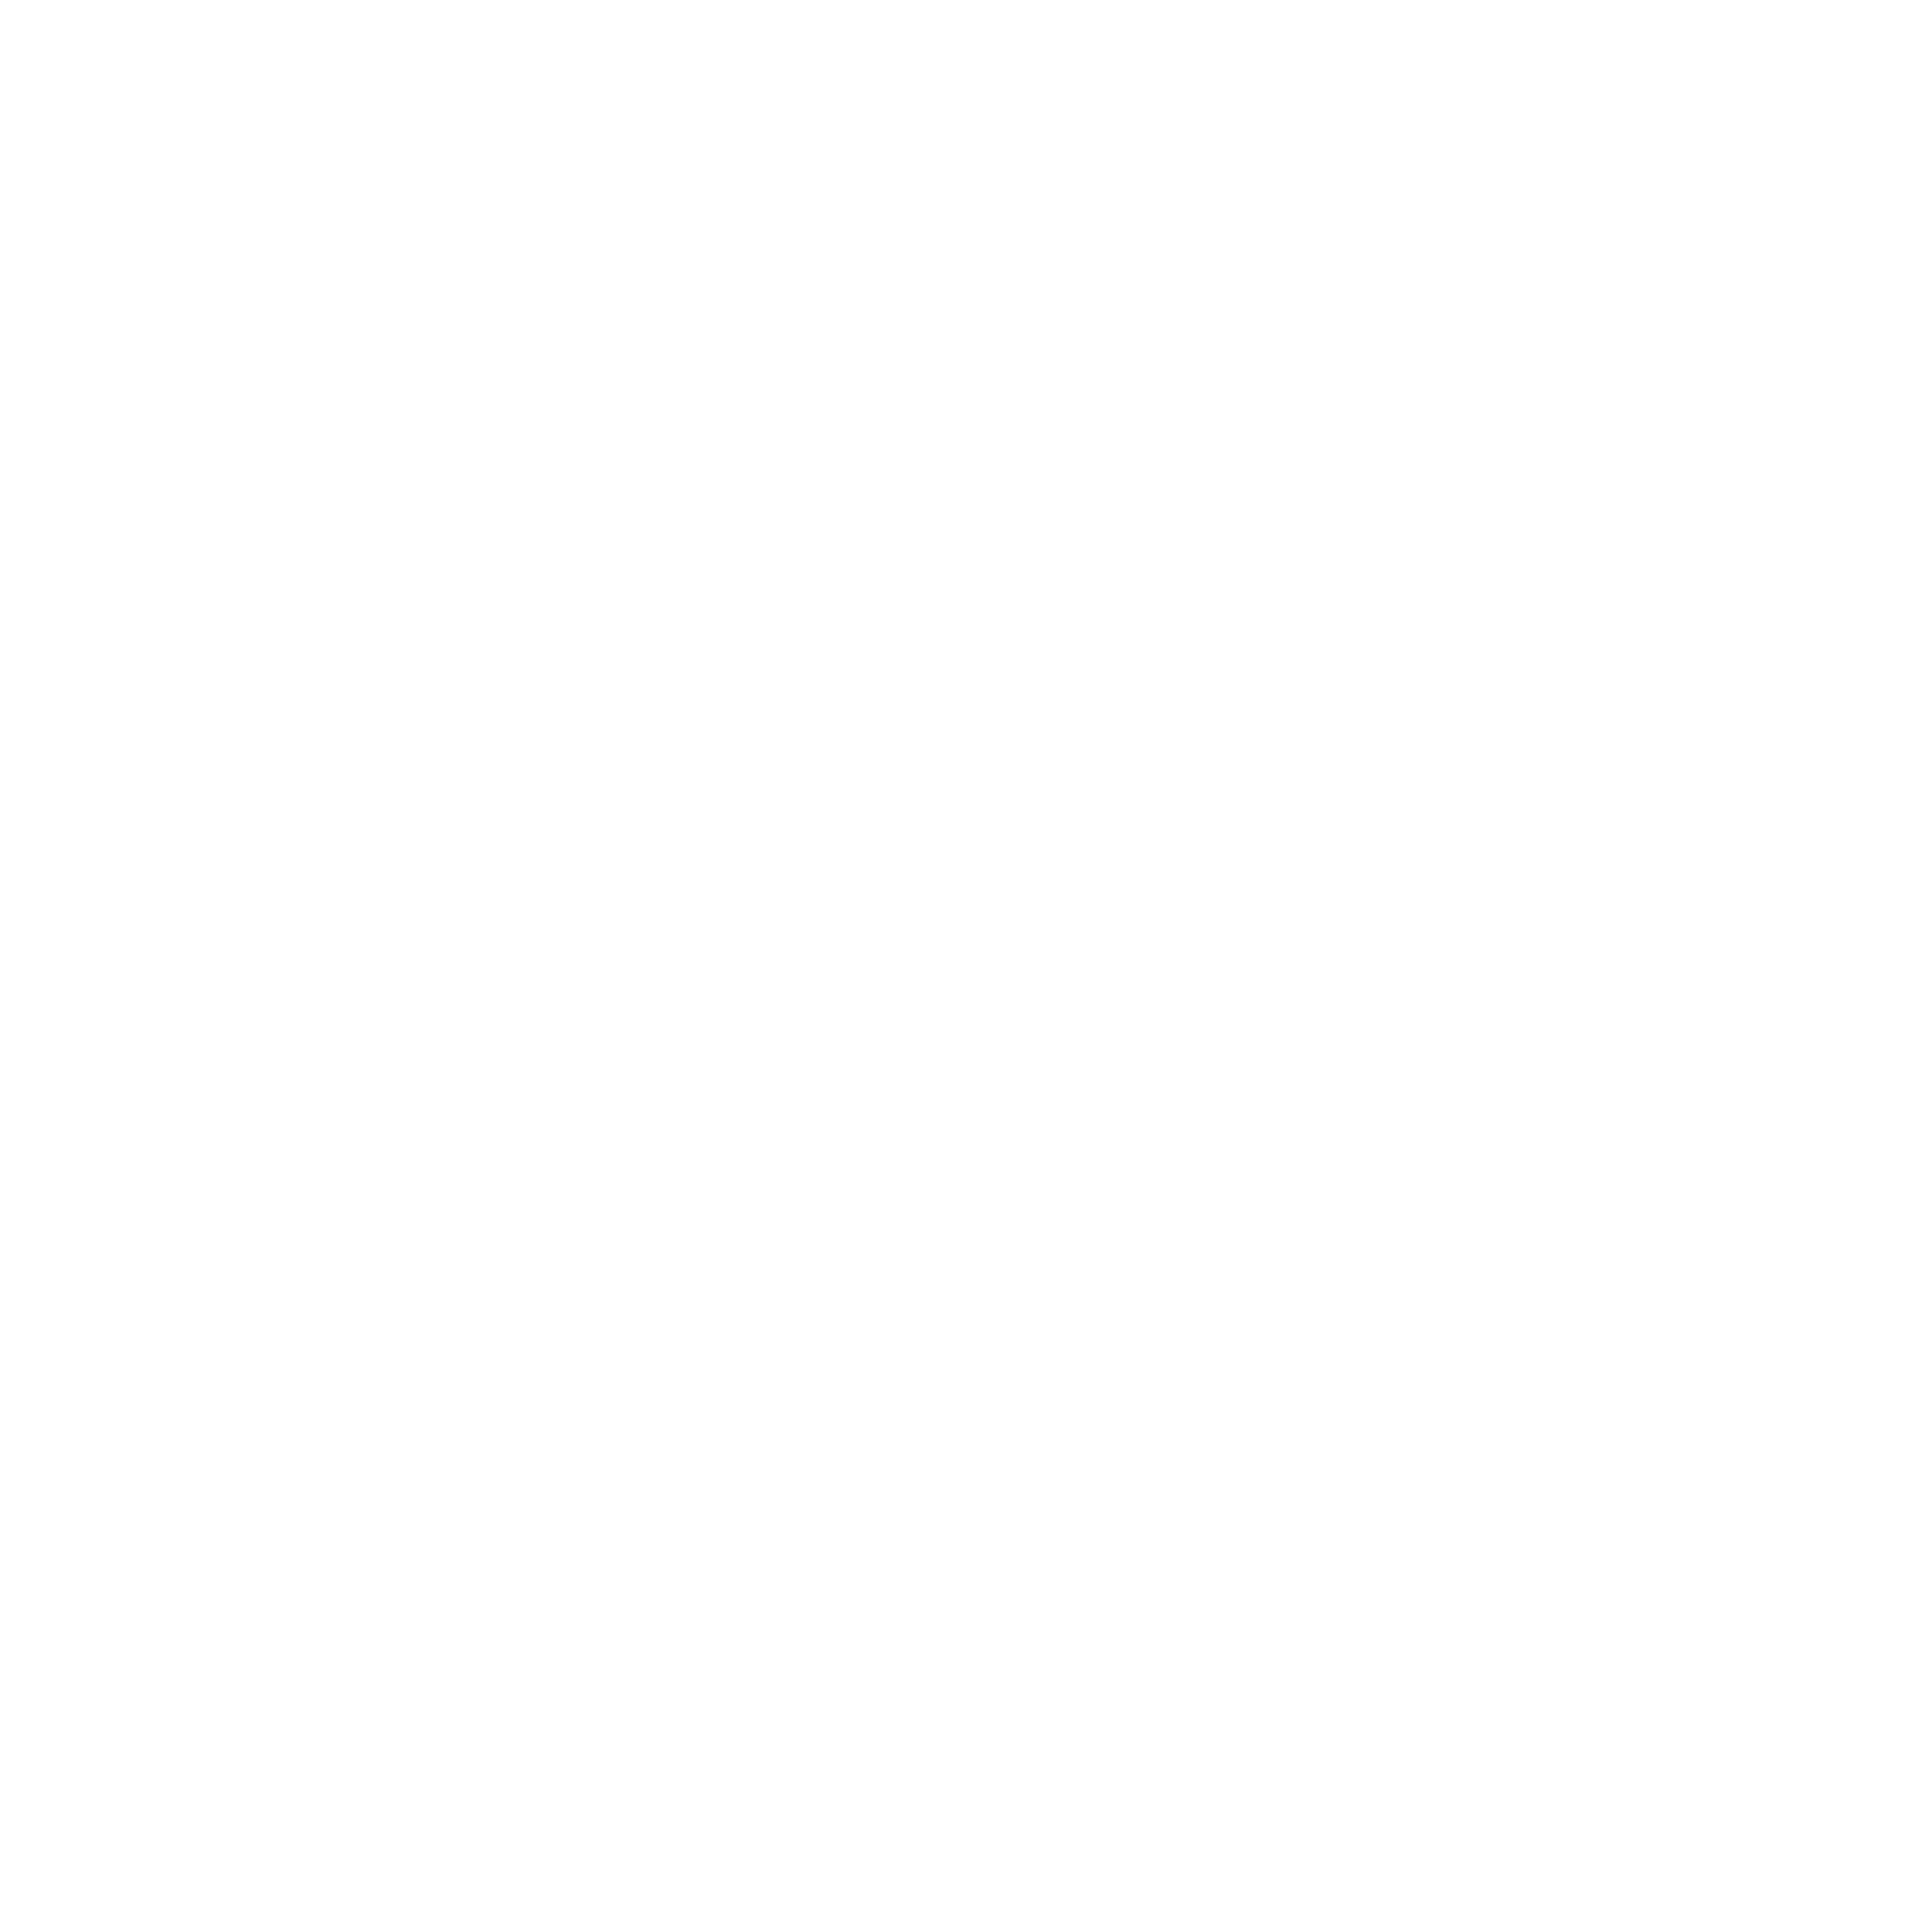 New logo needed for a World Class Tennis Academy